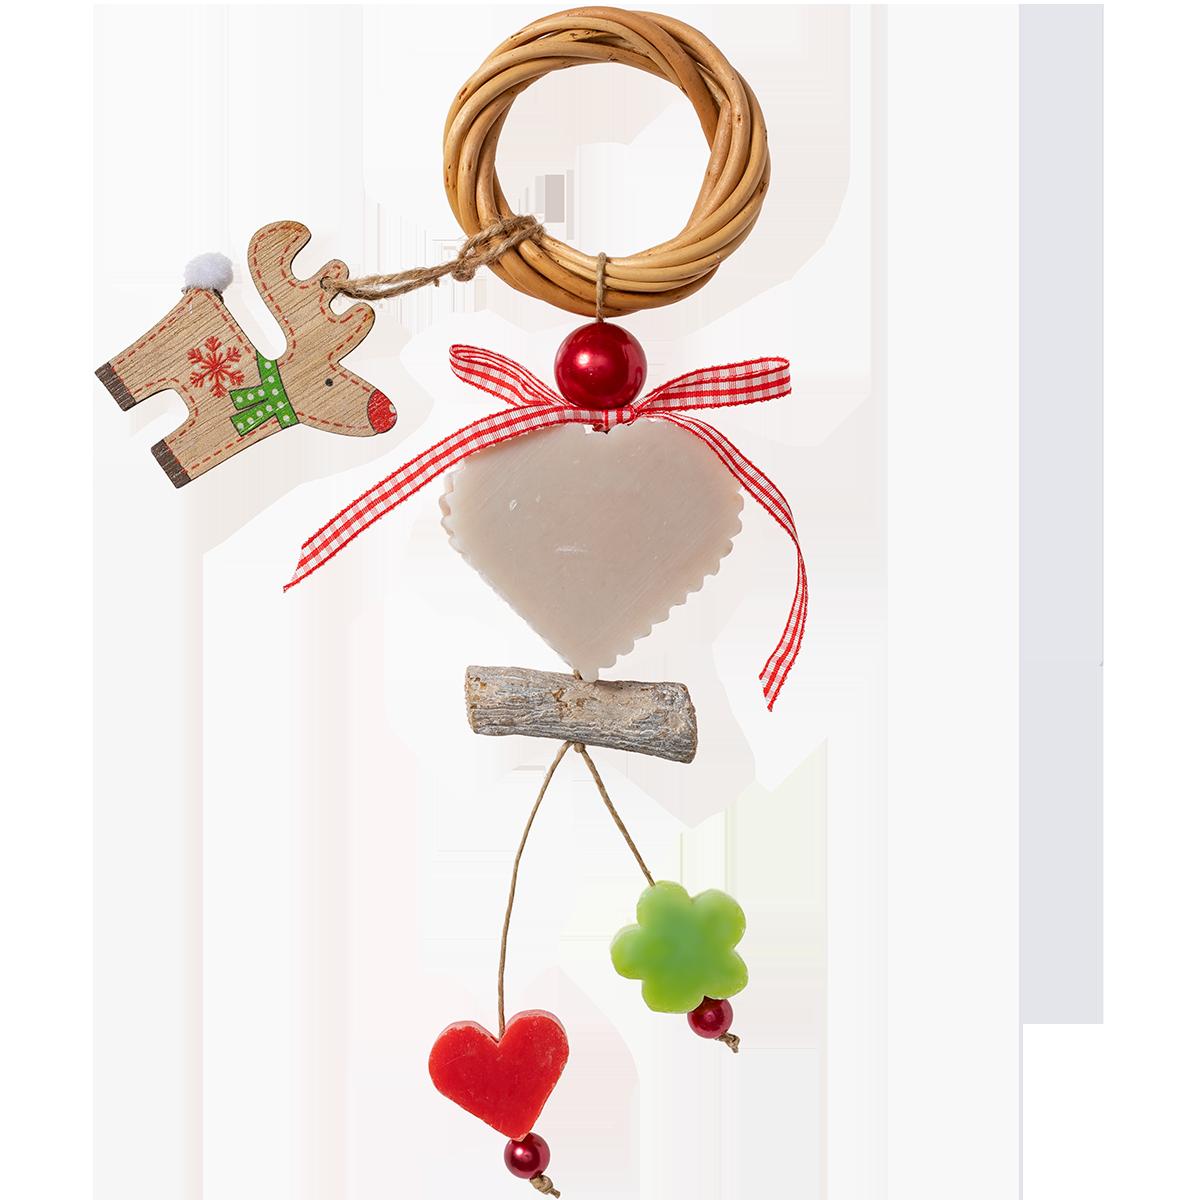 Ghirlanda-piccola-renna